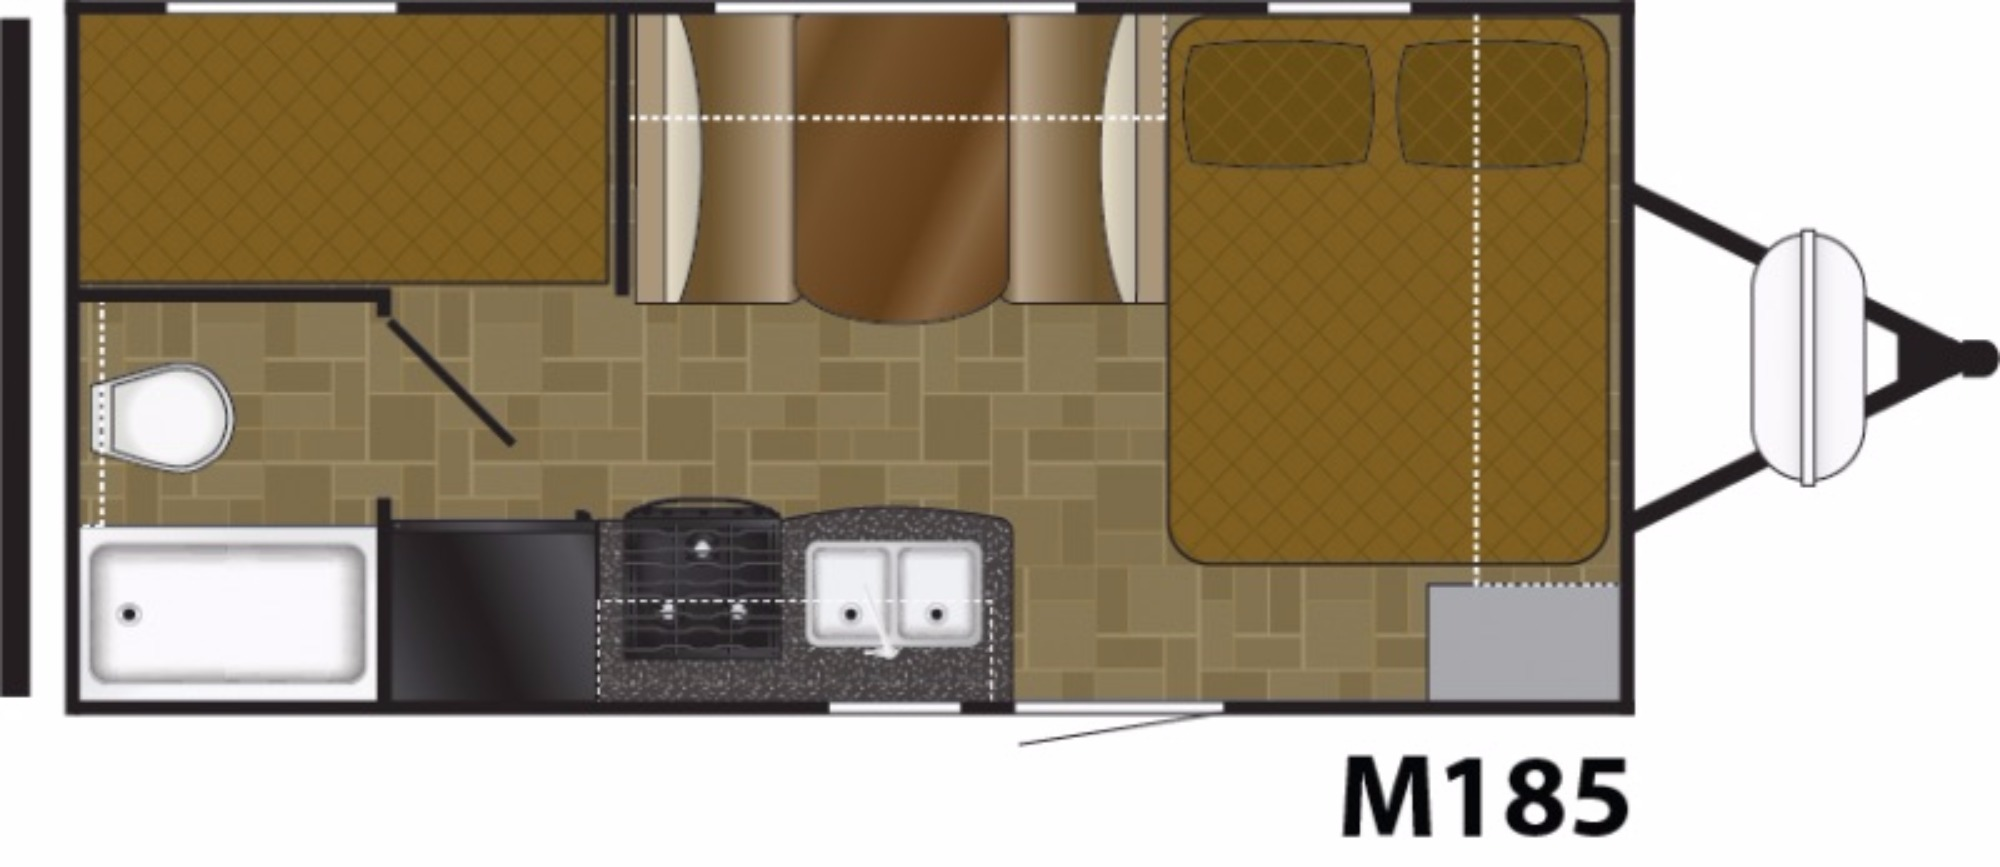 View Floor Plan for 2018 HEARTLAND MALLARD IDM185